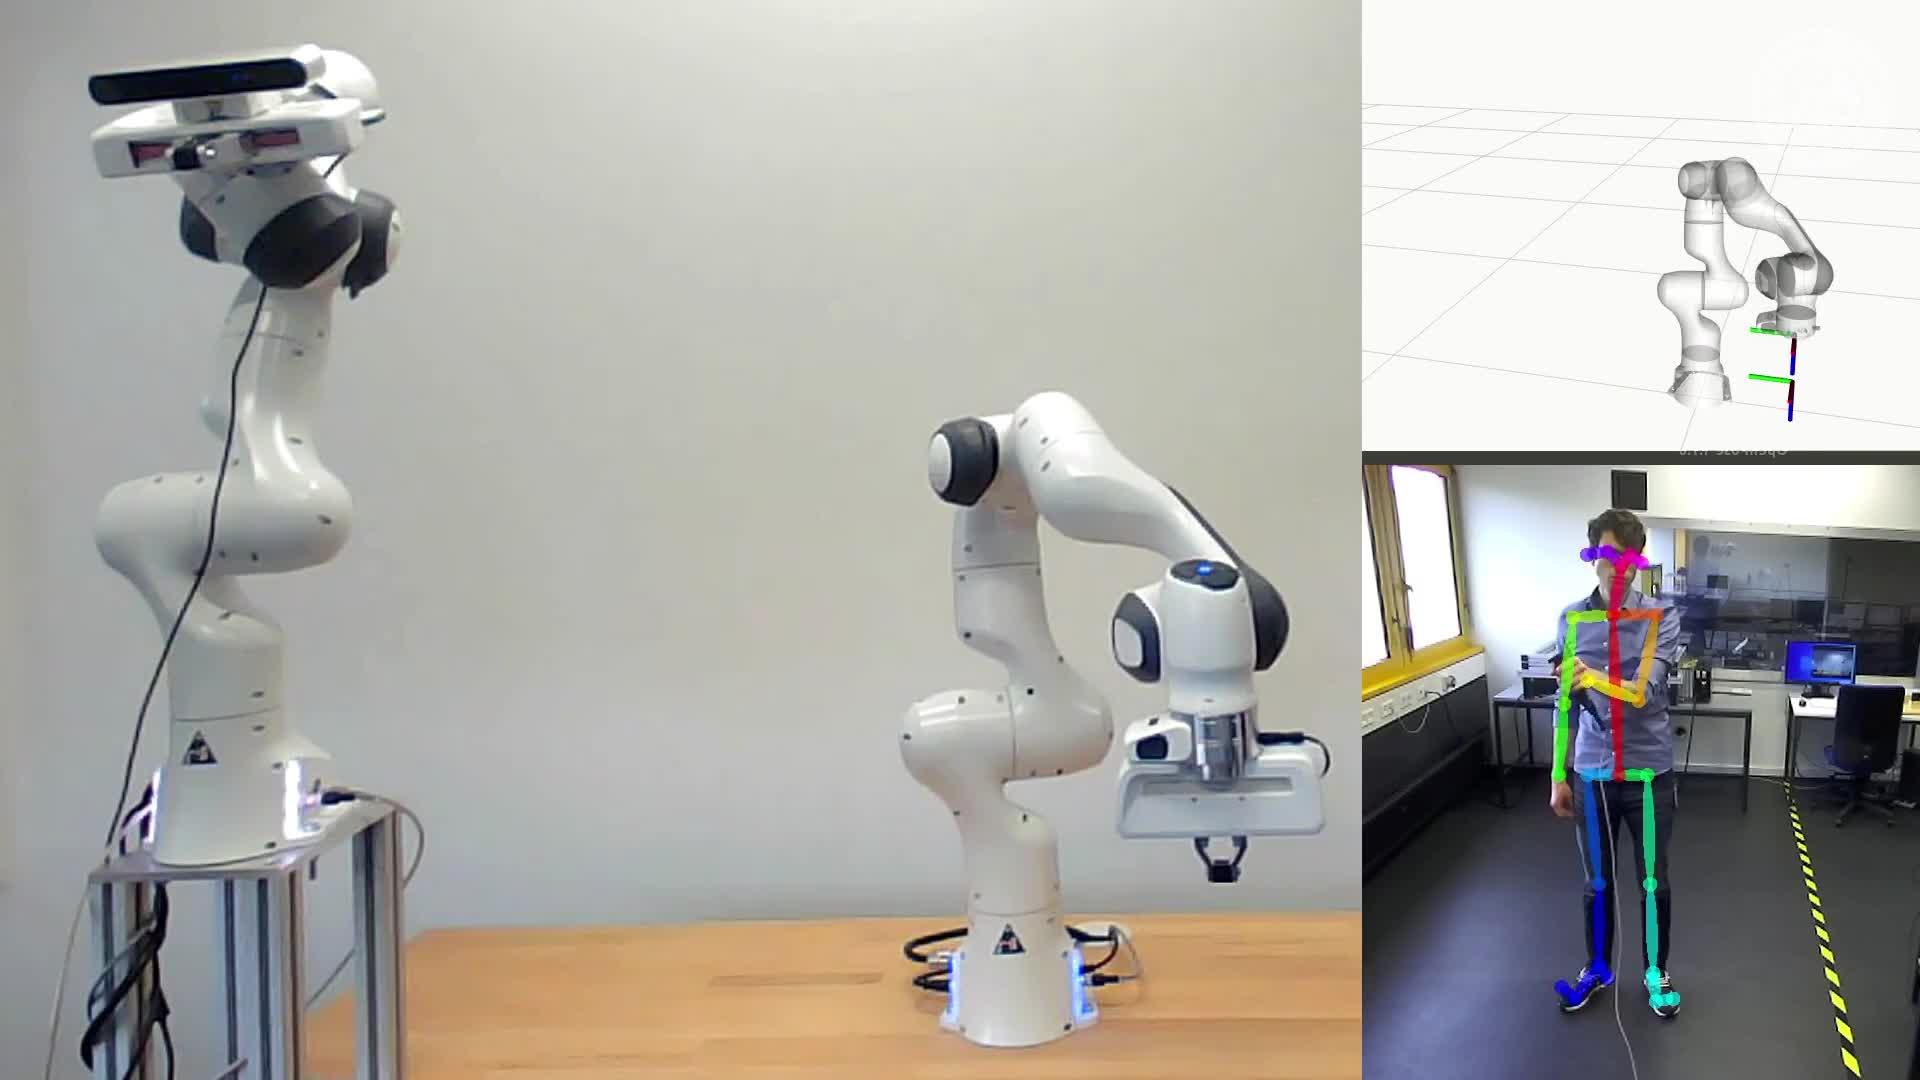 Skeleton Tracking using Model Predictive Interaction Control - #3 LRT Robotics Hackathon preview image